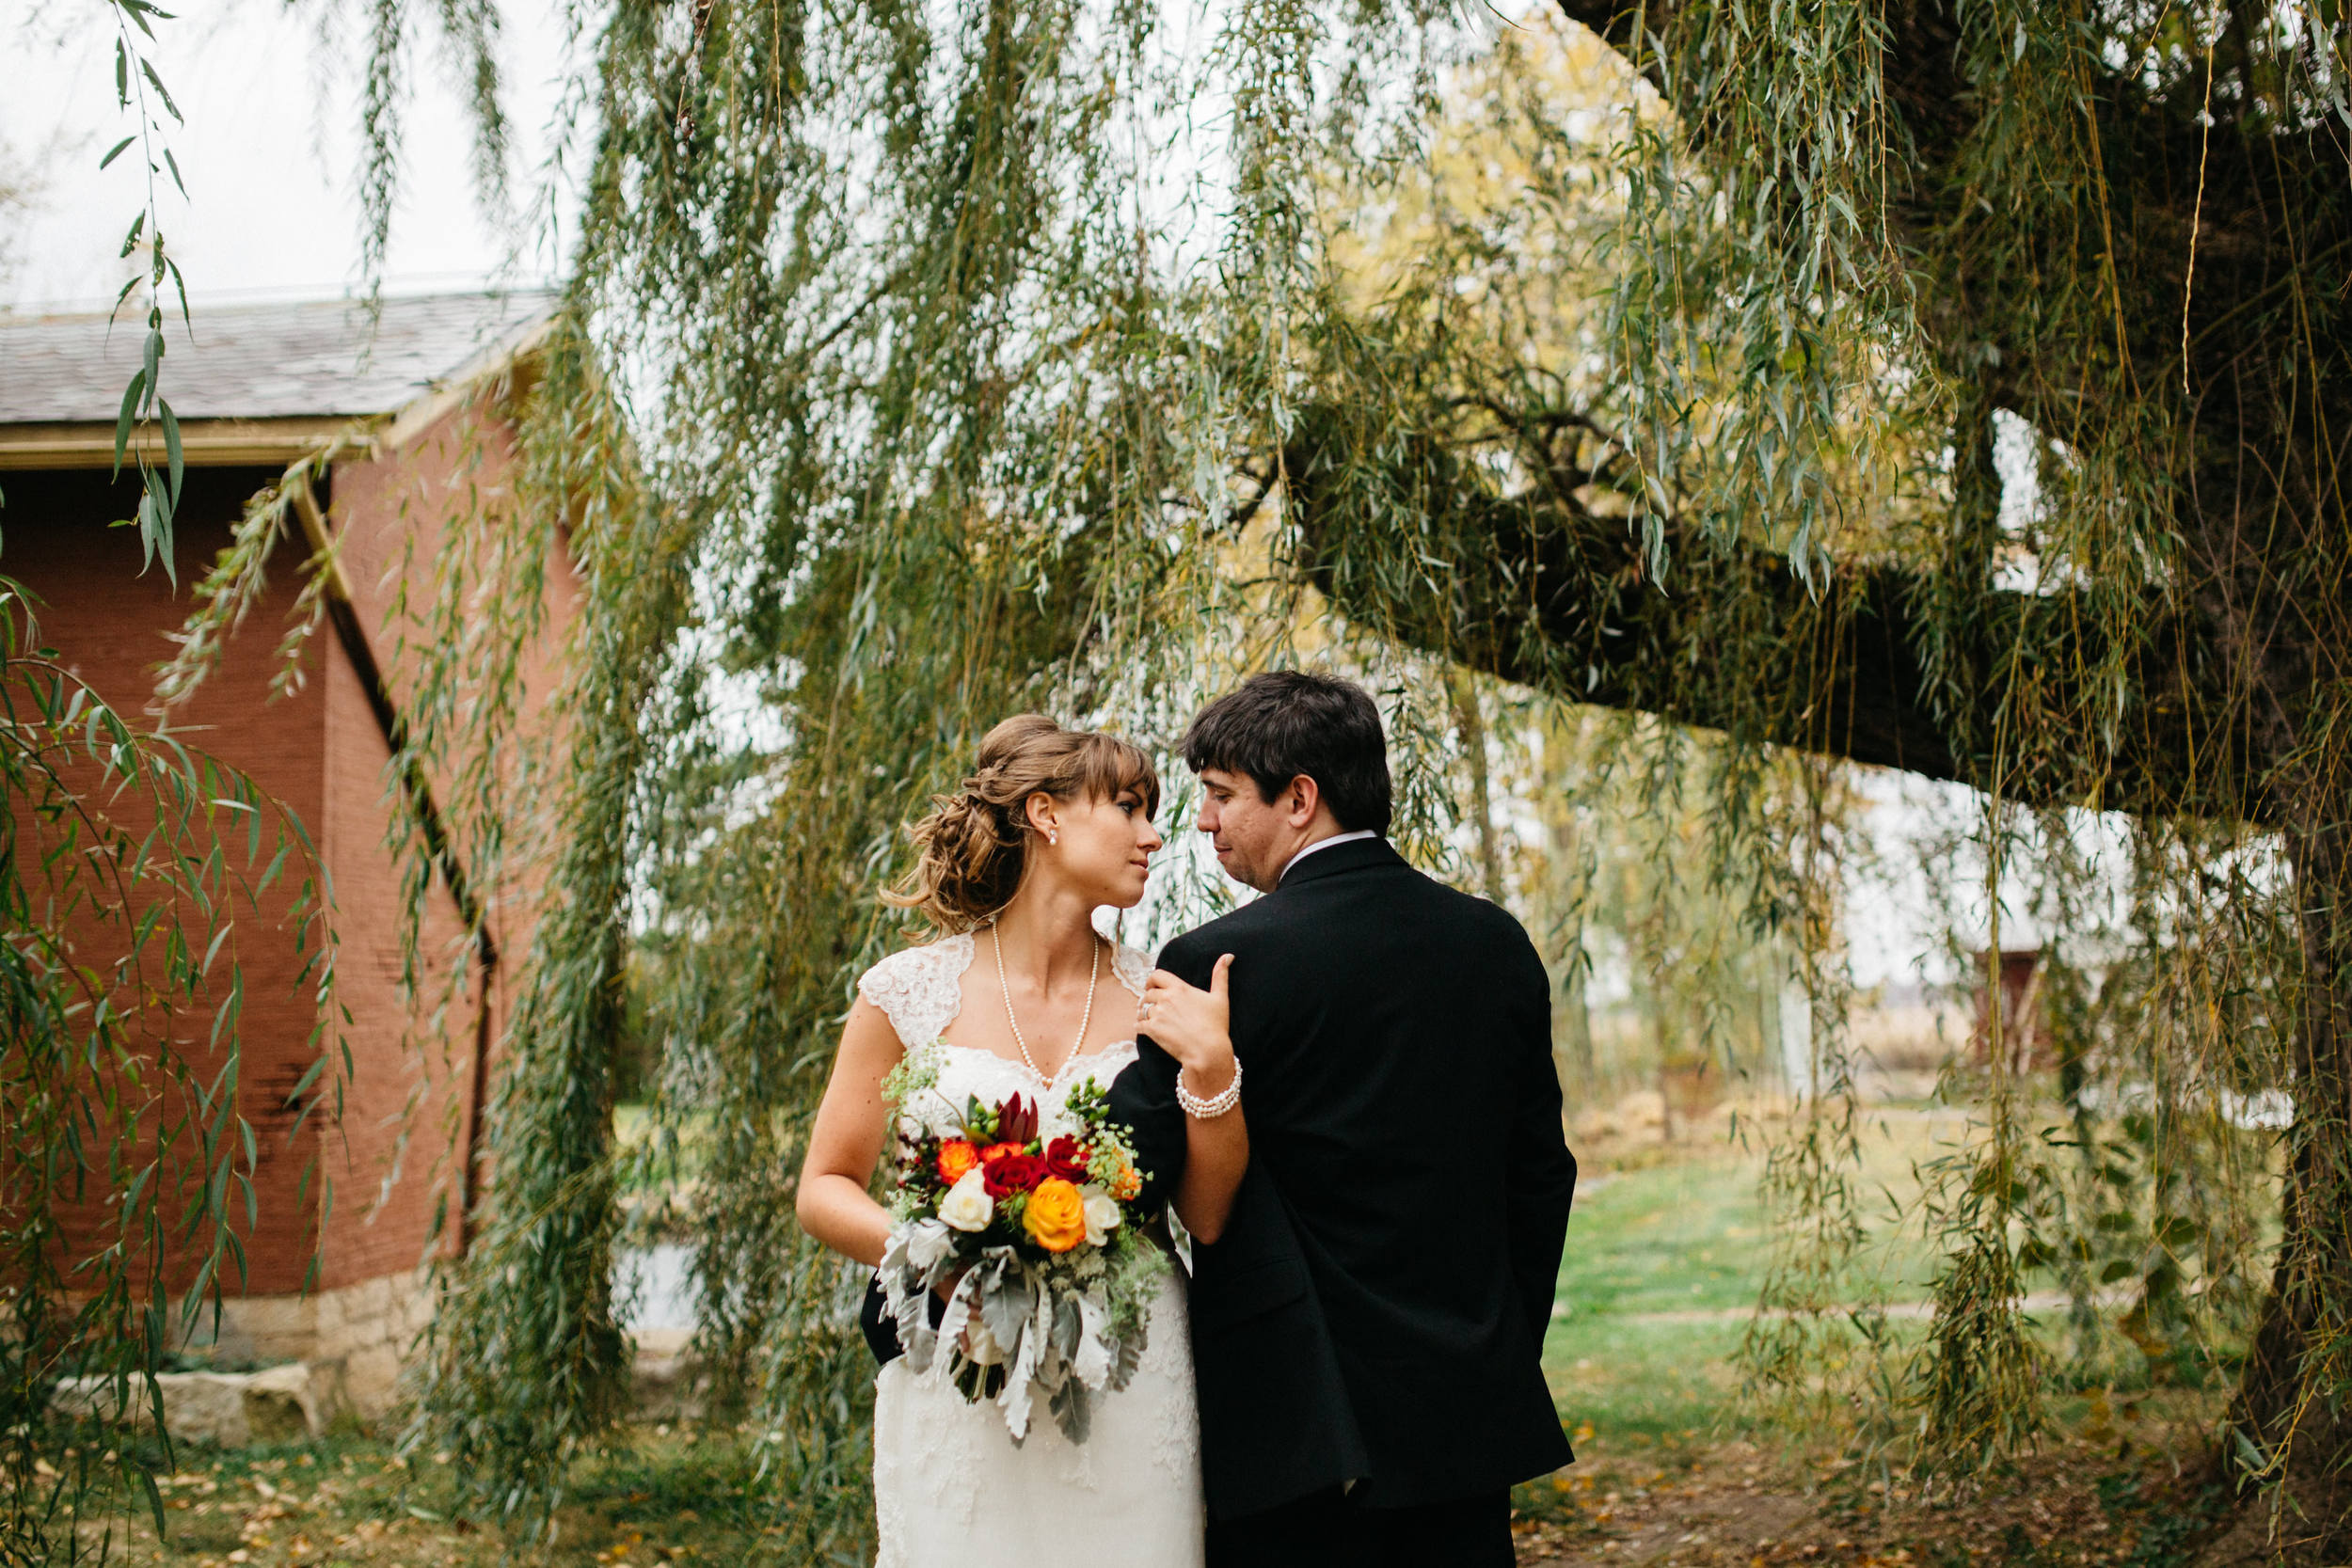 Wedding Portraits at The Willow Tree in Dayton, Ohio.